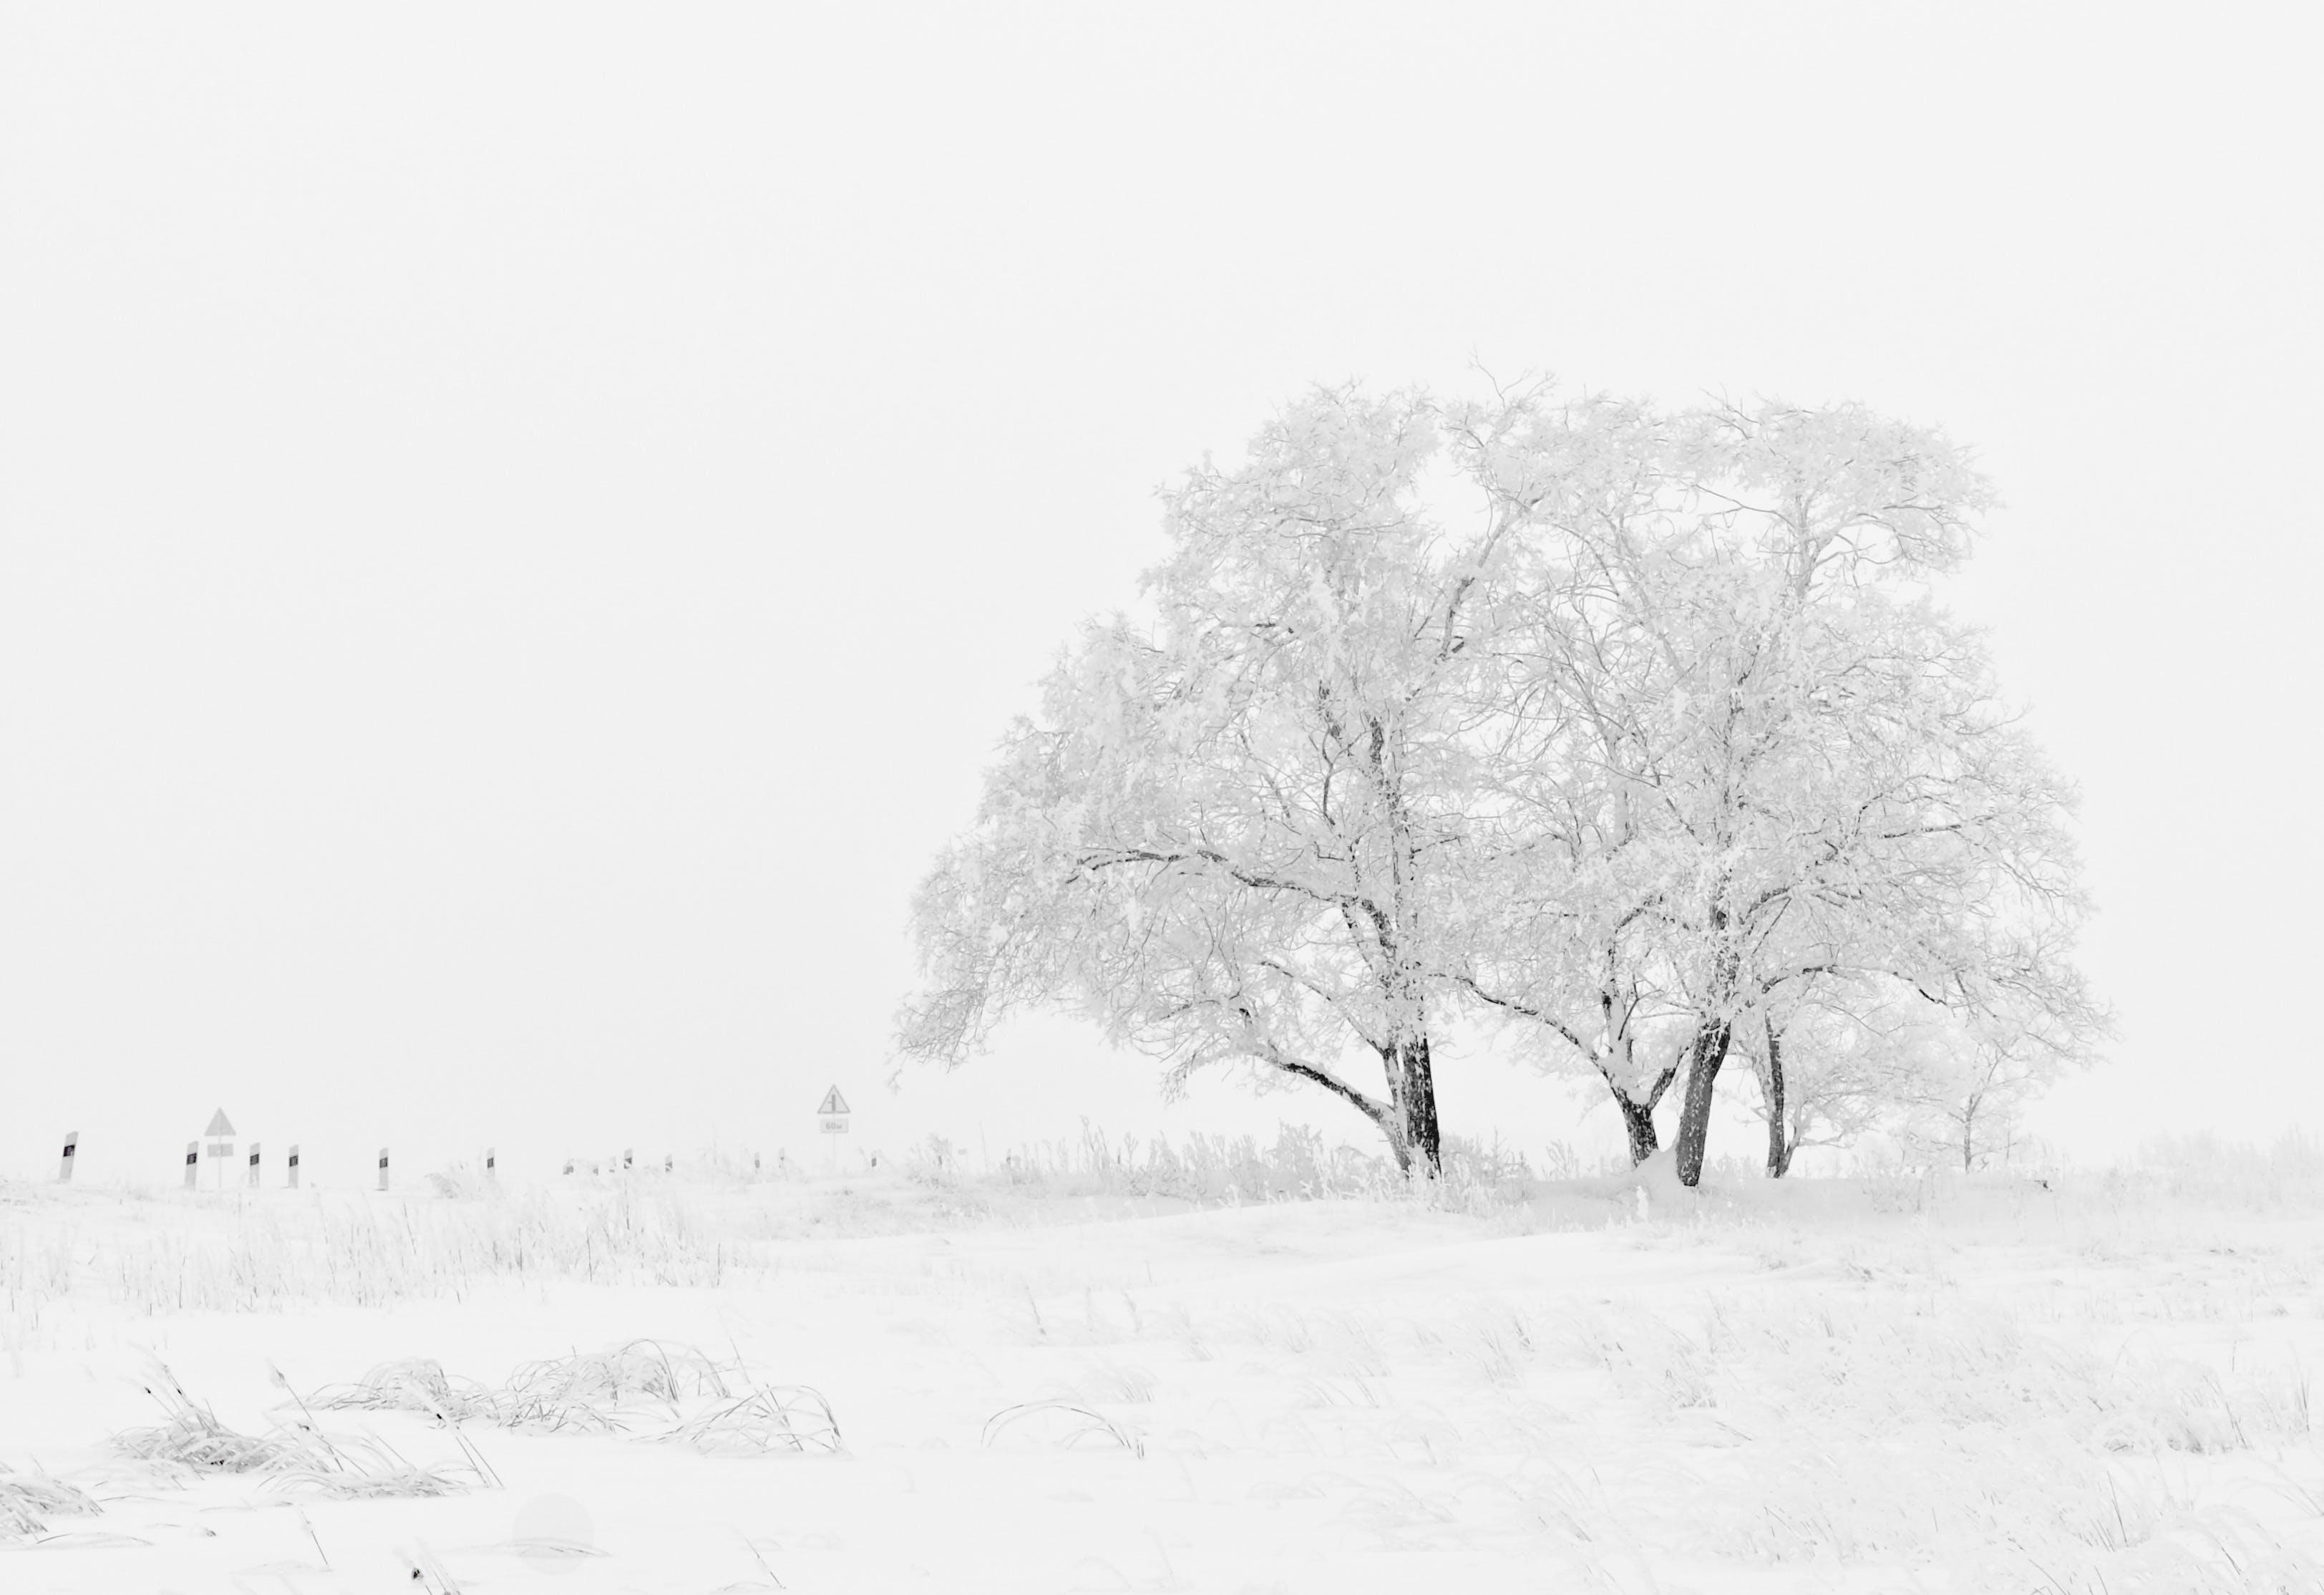 Kostenloses Stock Foto zu bäume, himmel, kalt, schnee